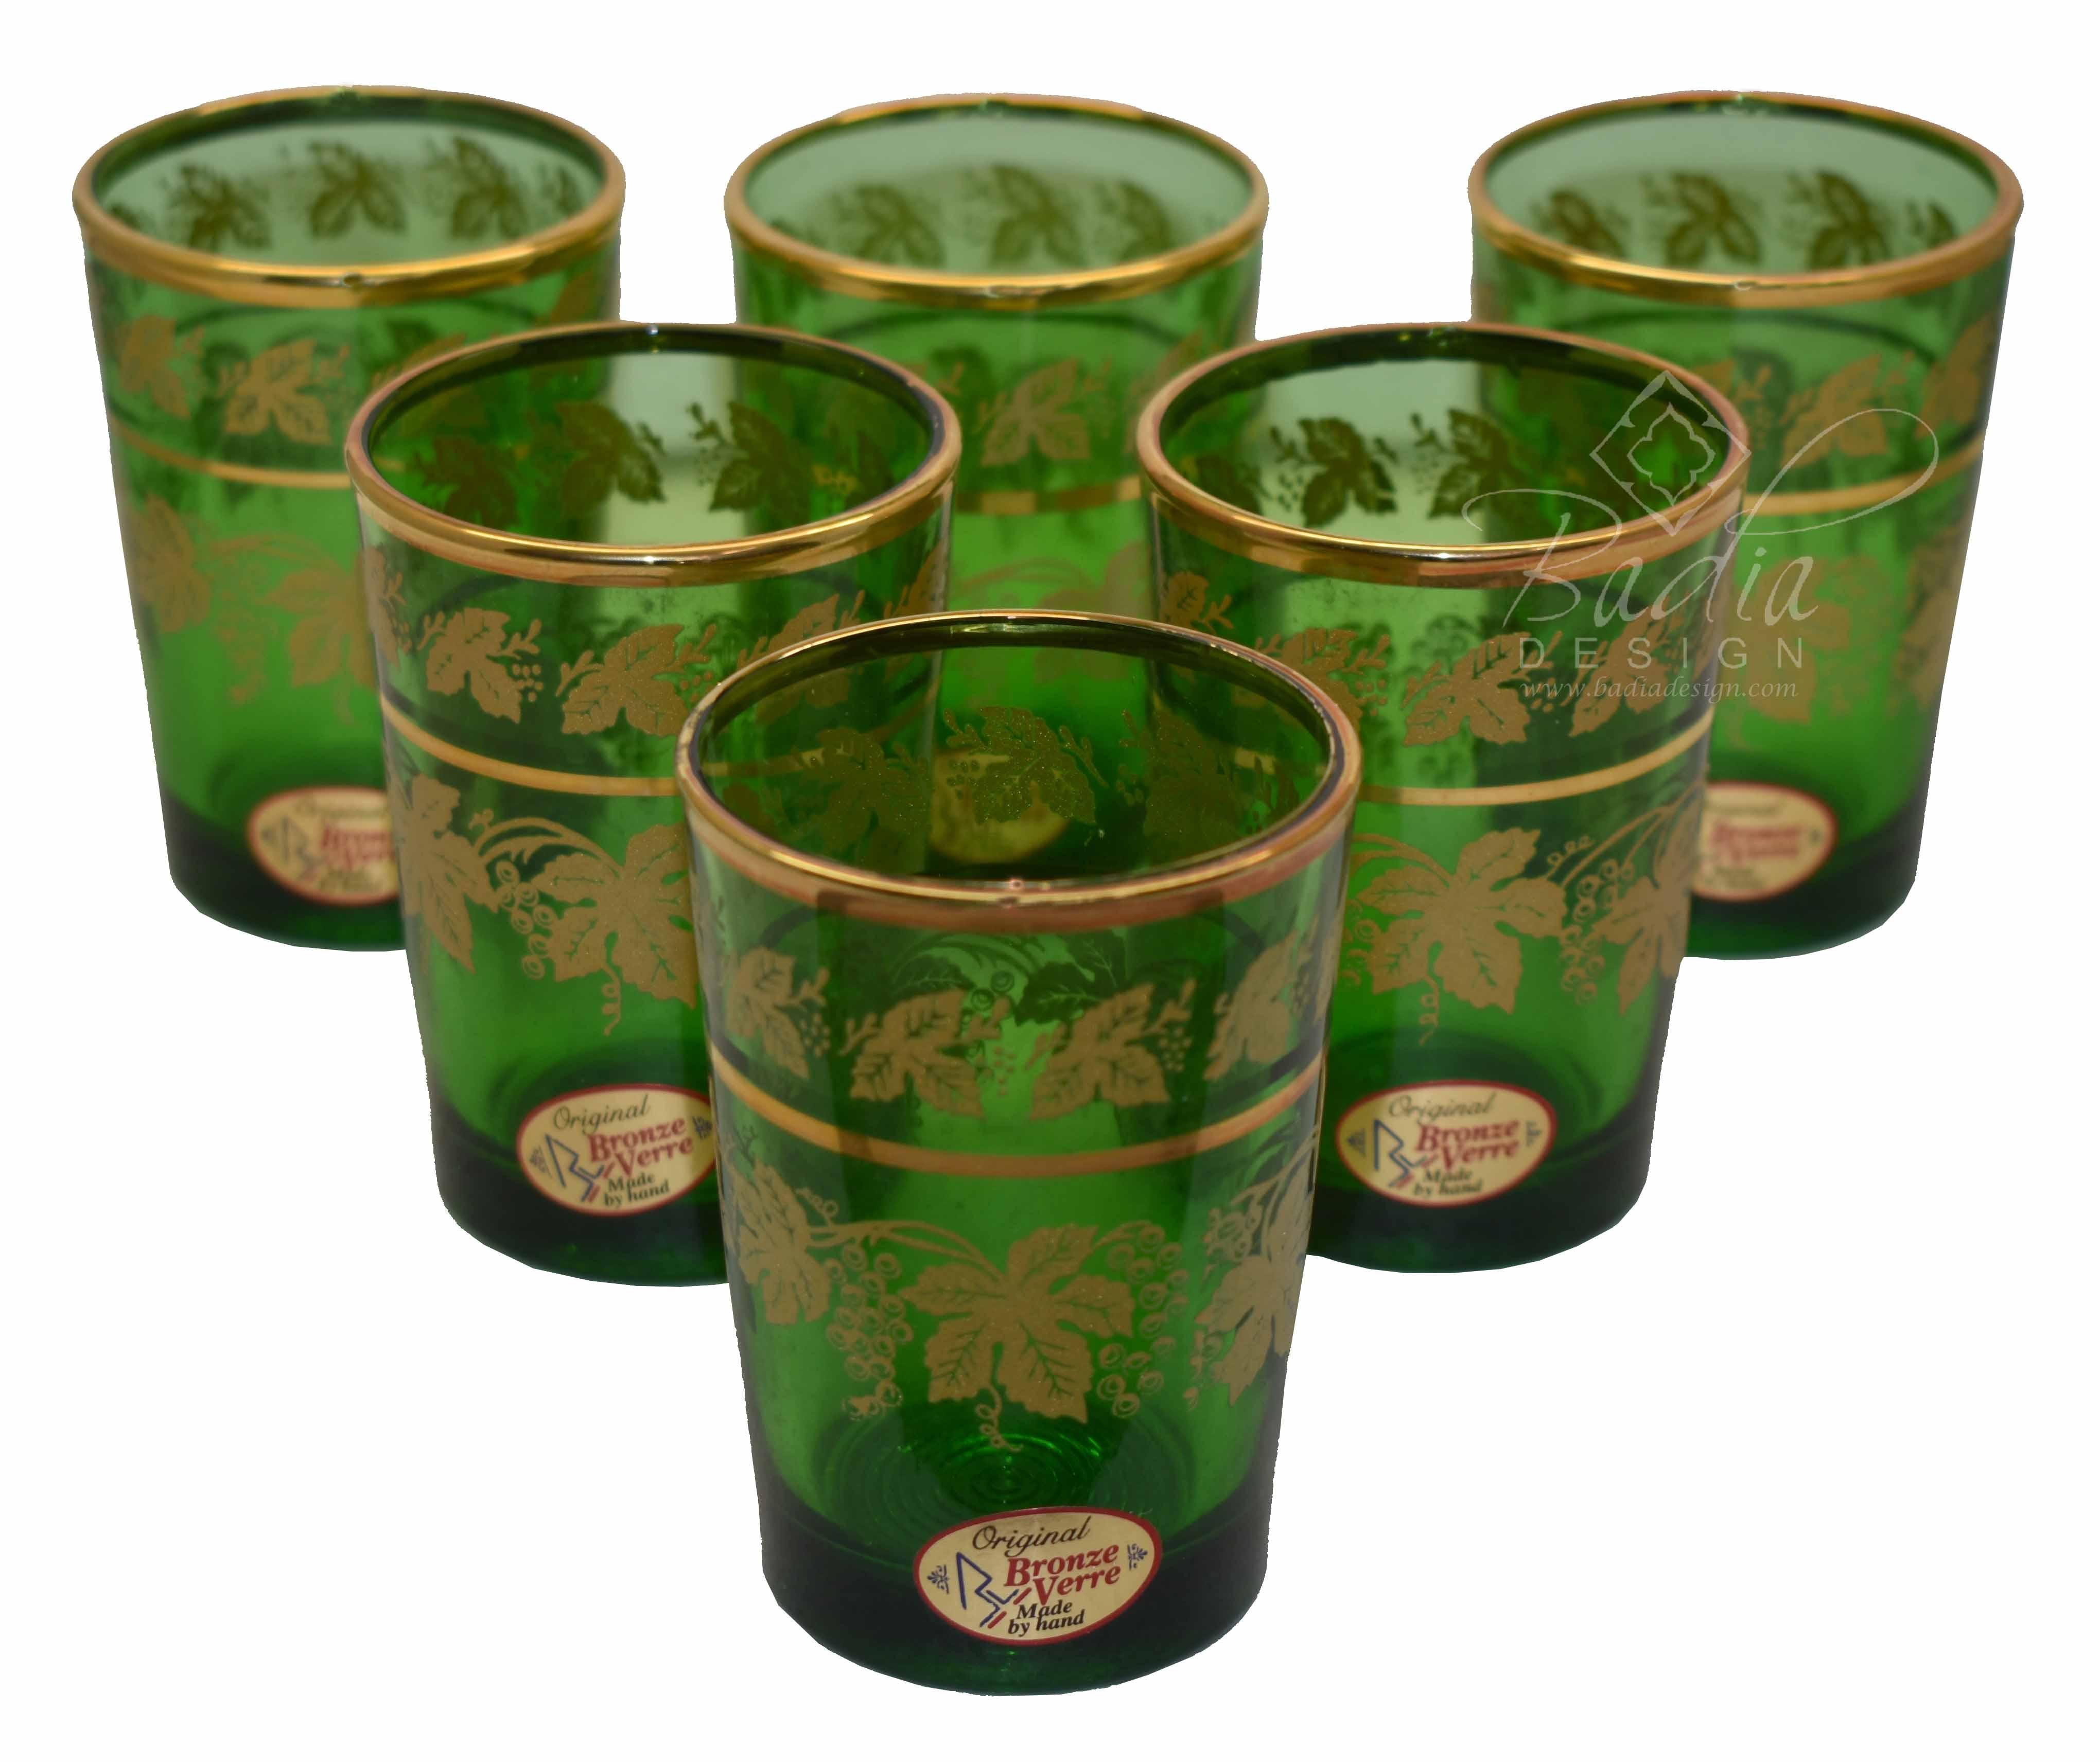 green-moroccan-tea-glasses-with-gold-motif-design-tg023.jpg